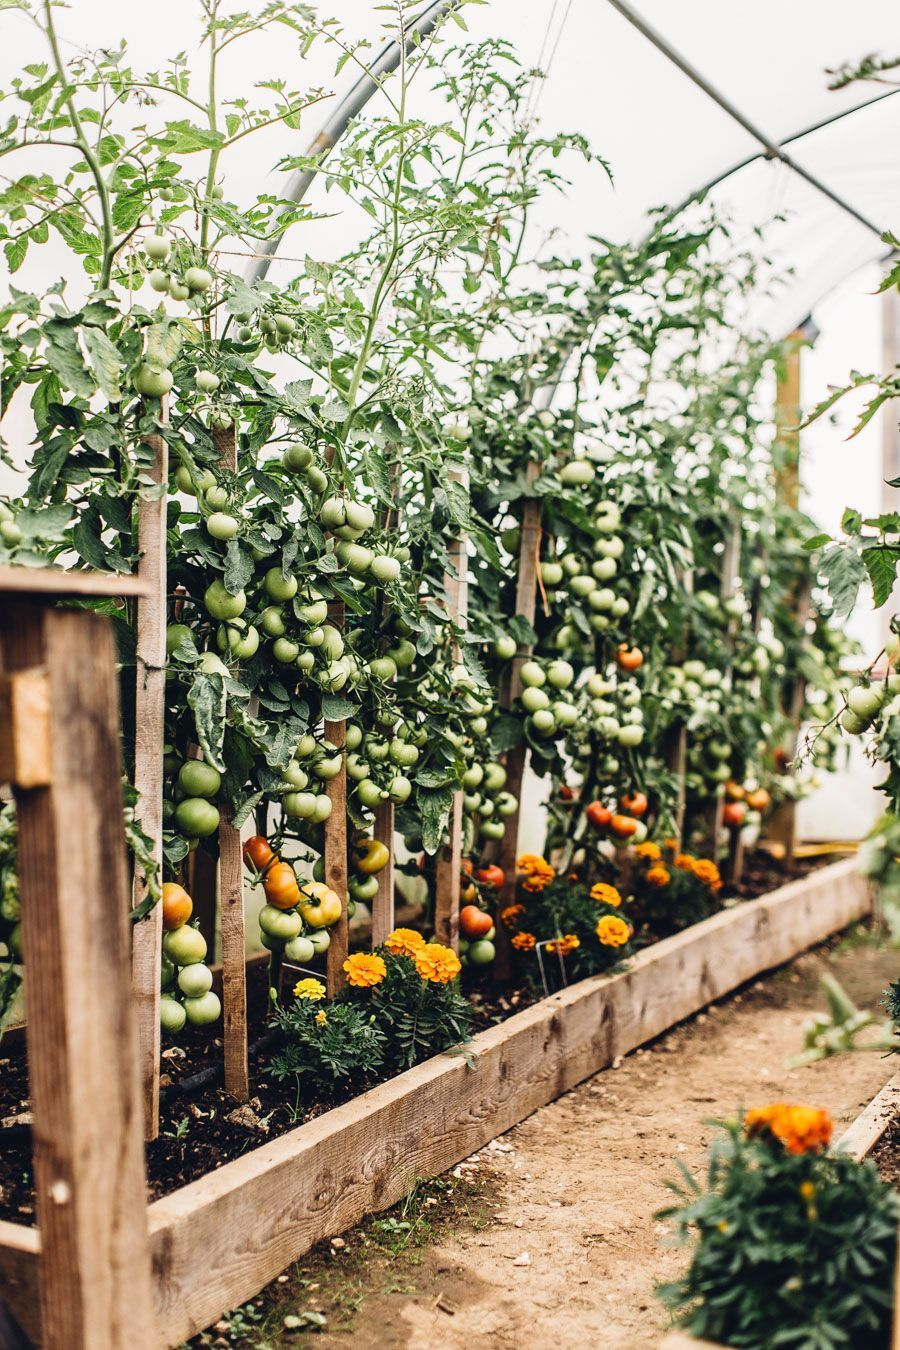 Tomato Growing Love Articlesblog Vegetable Garden 640 x 480